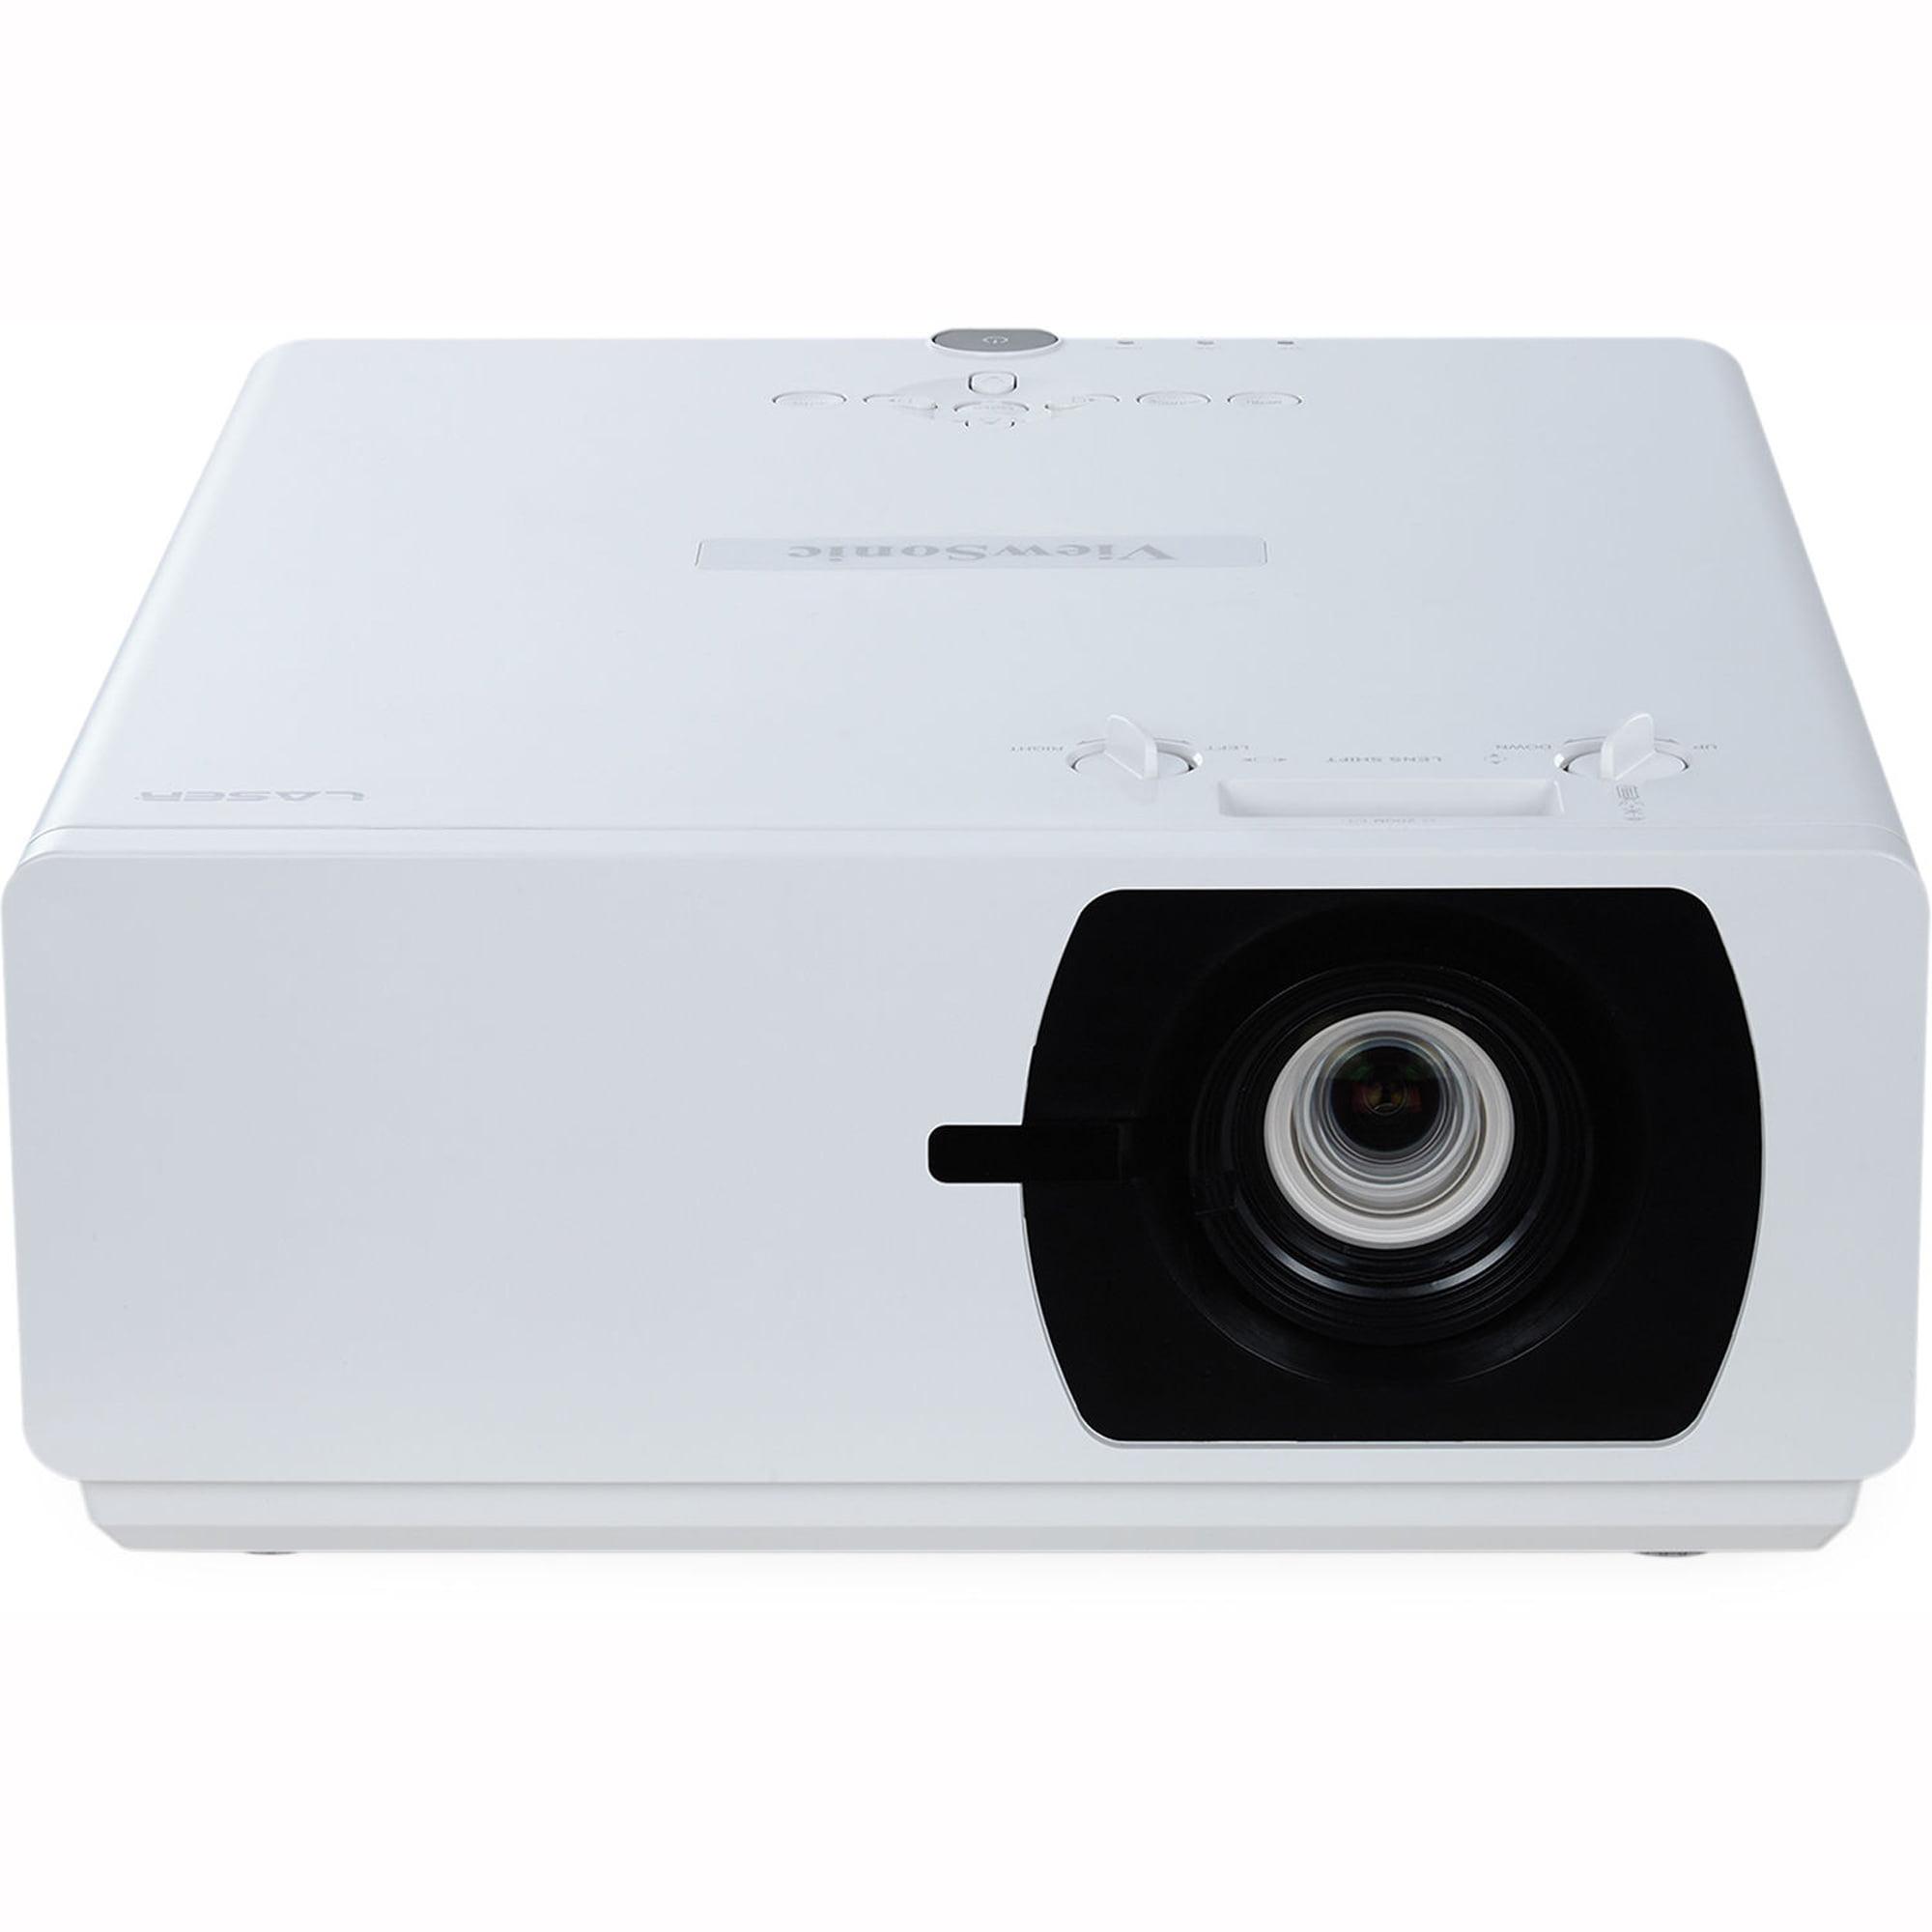 ViewSonic LS800WU High Brightness WUXGA Laser Projector for professional installations, 5500 lm, HDBaseT, HV... by Viewsonic